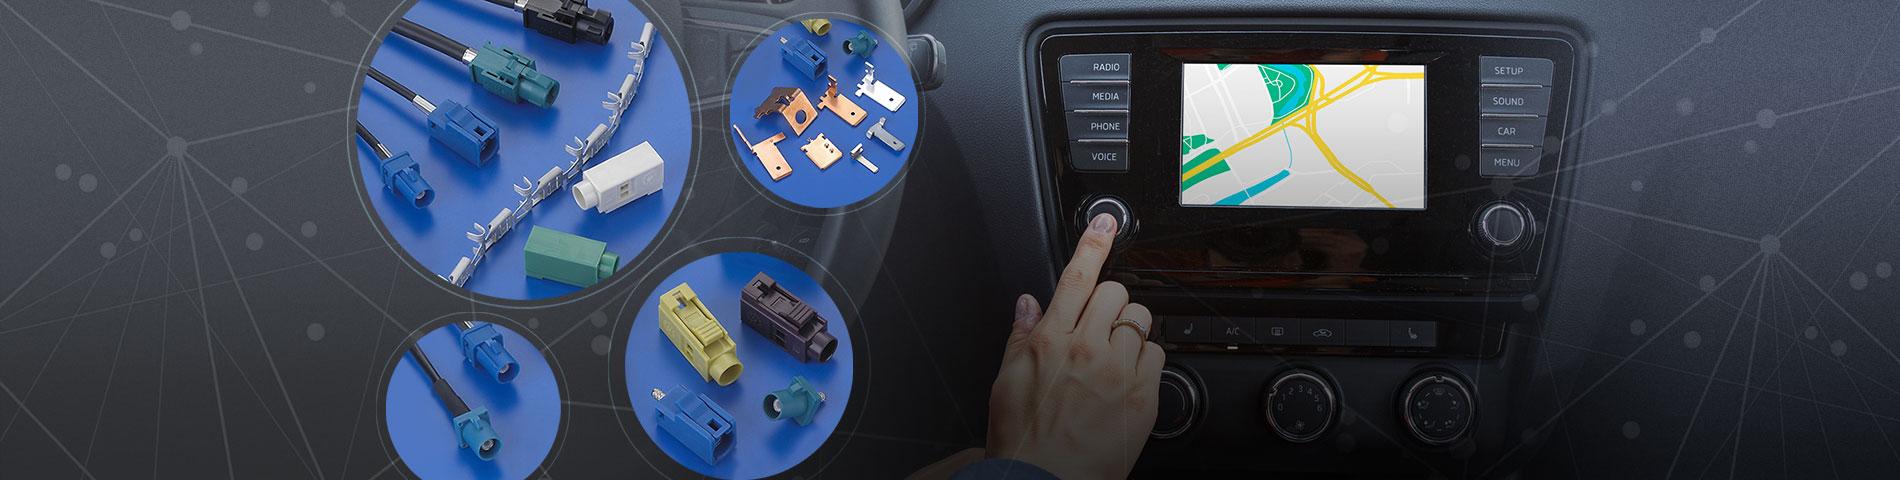 رابط خودرو کاربرد